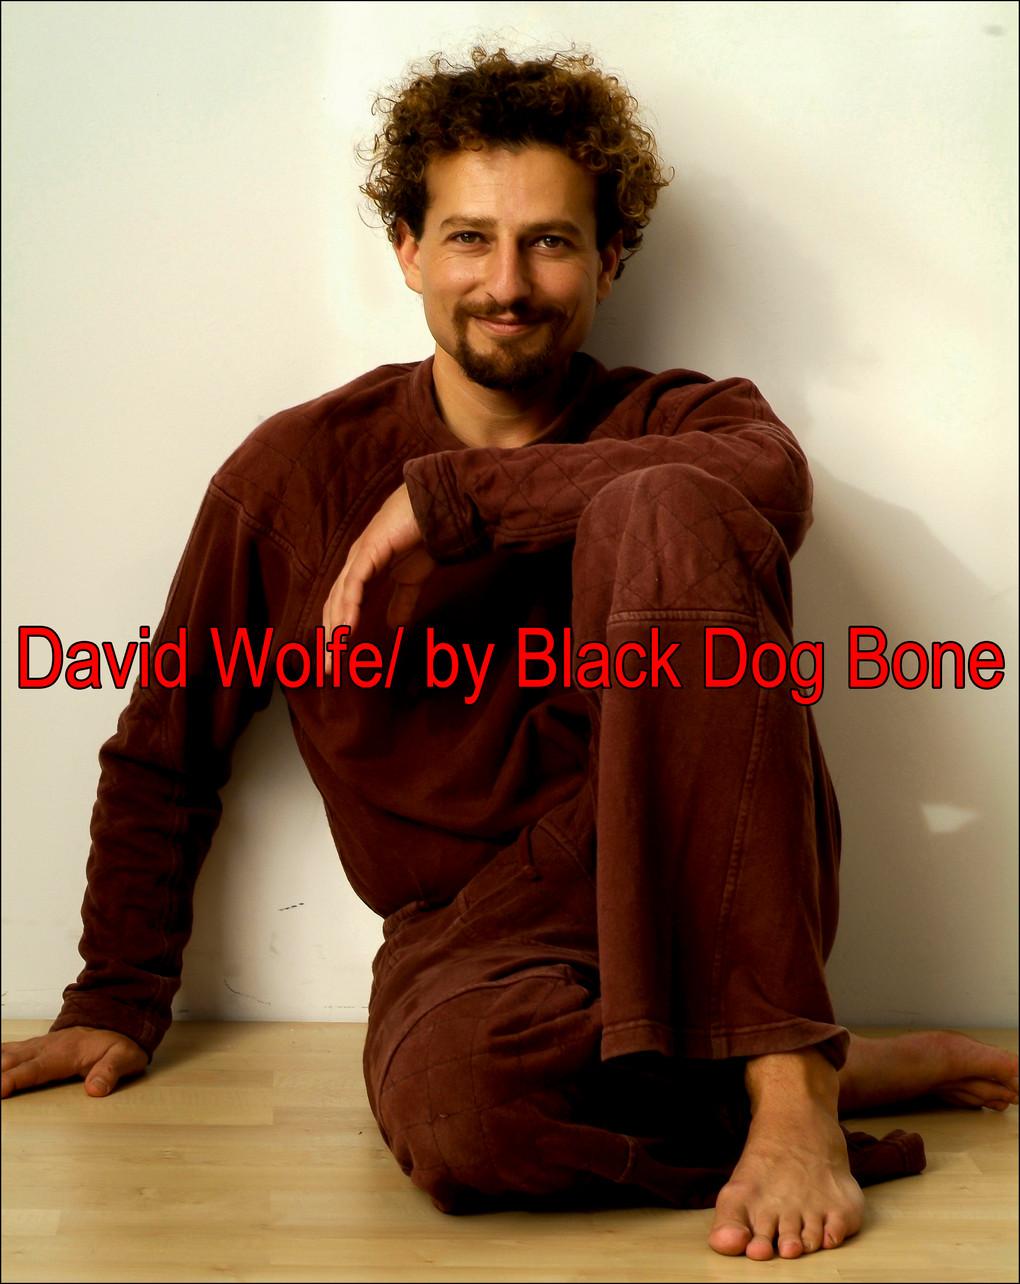 David Wolfe: raw food/ Interview by Black Dog Bone